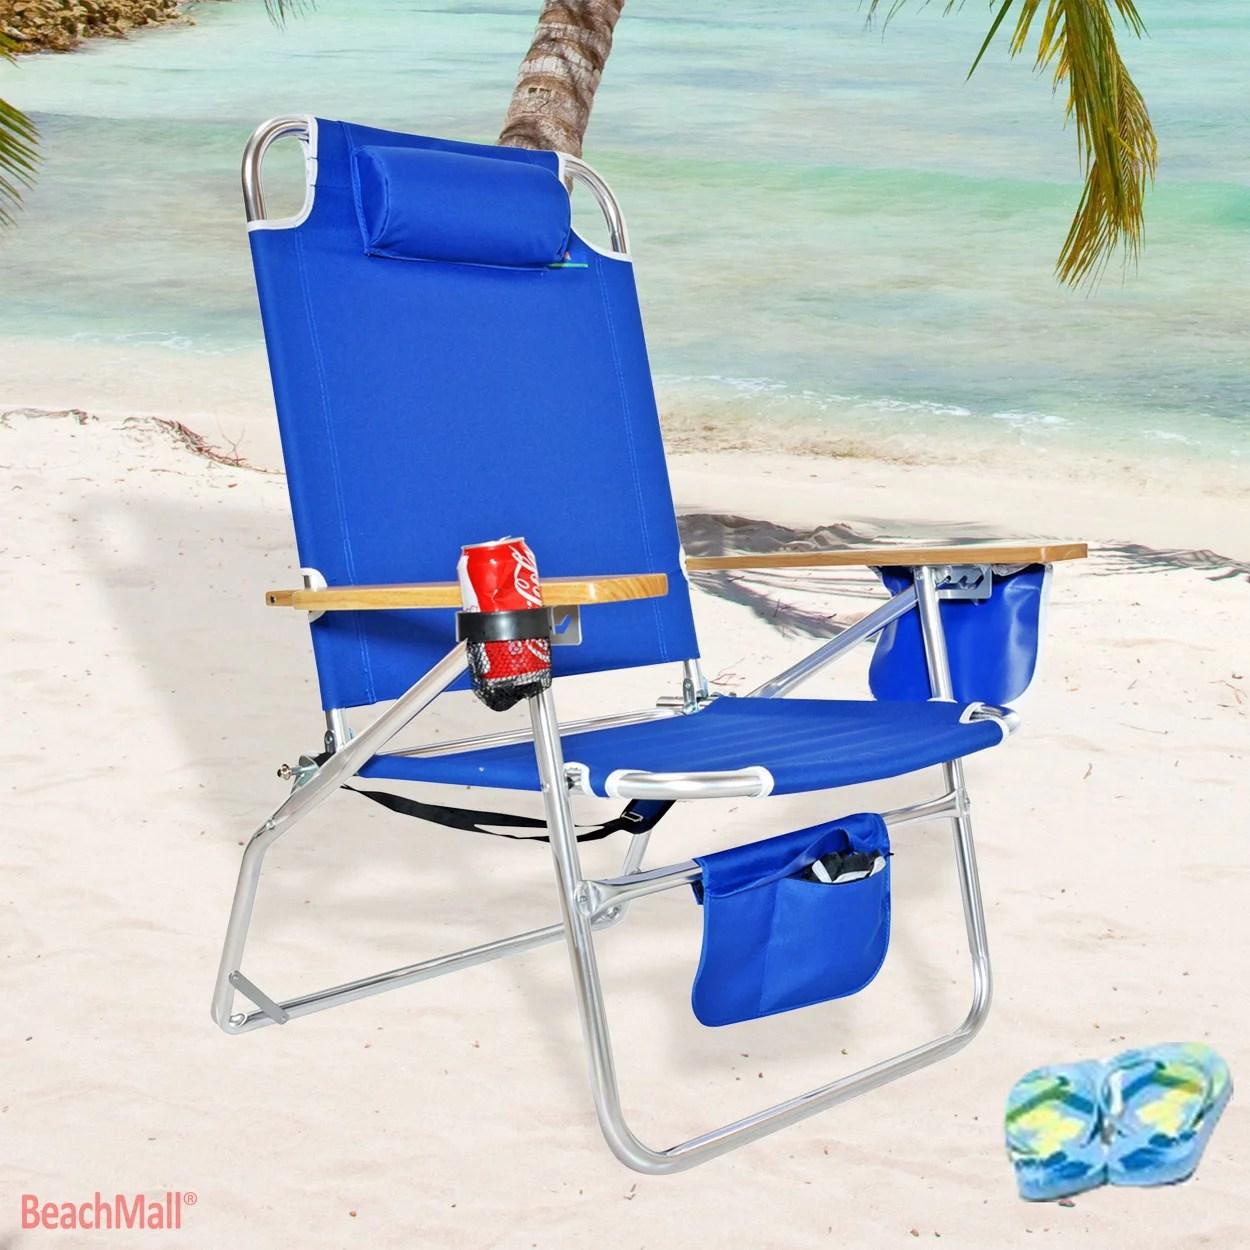 beach chairs for cheap caravan sports zero gravity chair big jumbo heavy duty 500 lbs xl aluminum tall like new walmart com